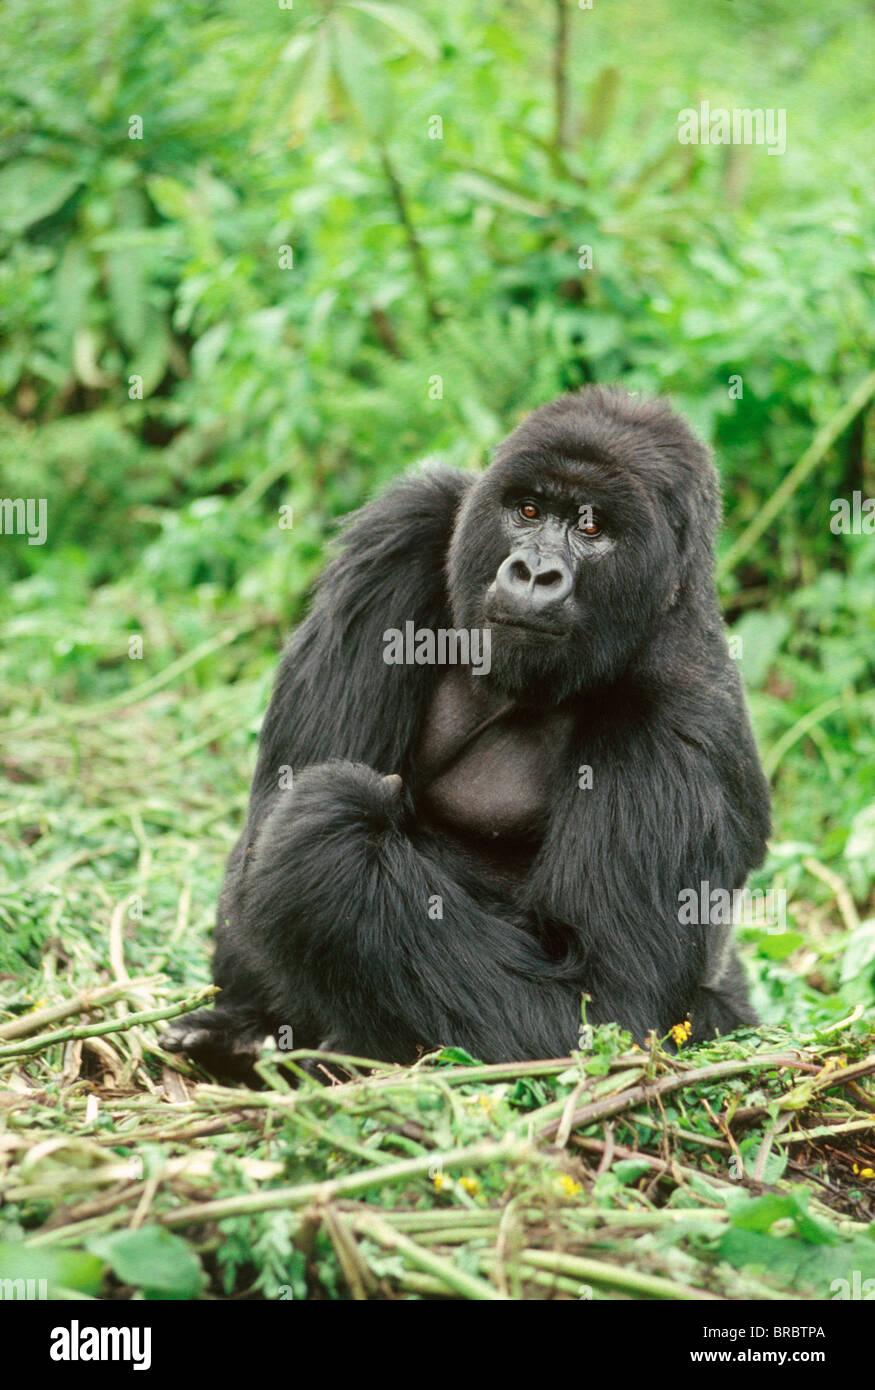 Gorilla di Montagna (Gorilla beringei Gorilla Silverback) maschio, vulcani Virunga, Ruanda Immagini Stock